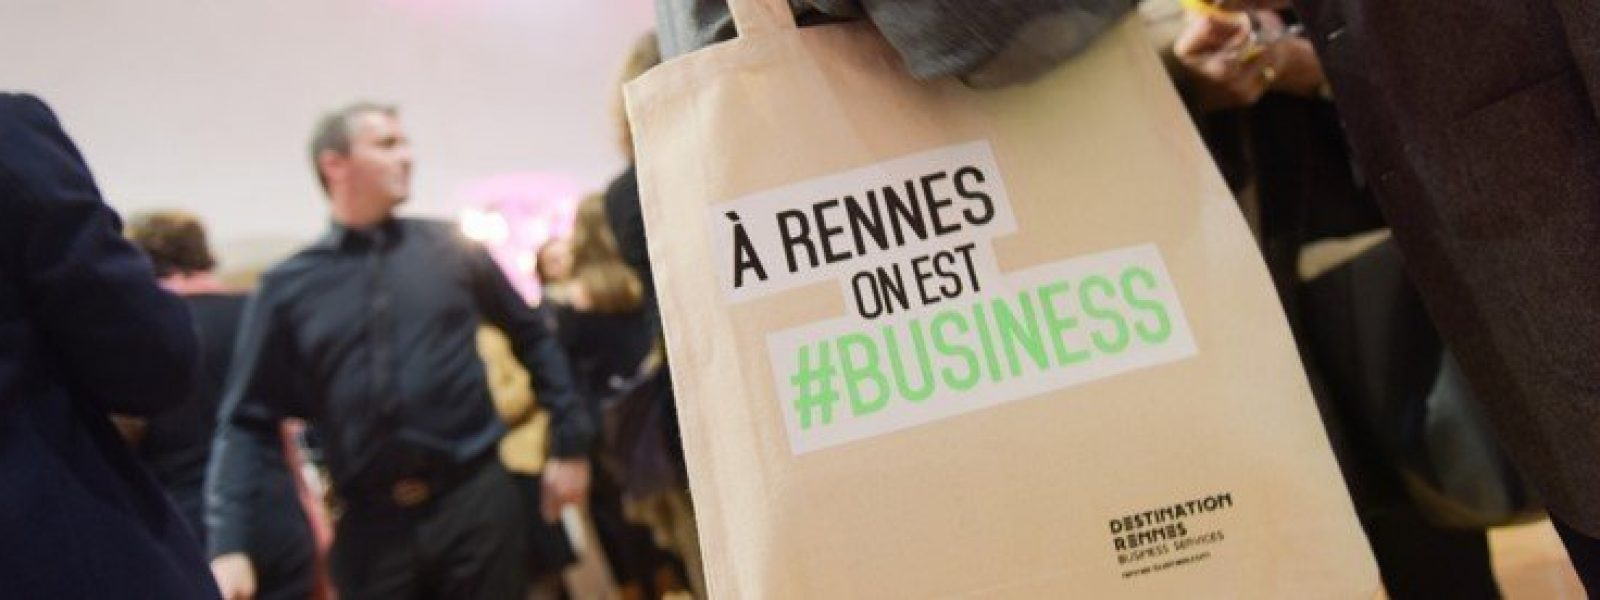 A Rennes, on est Business